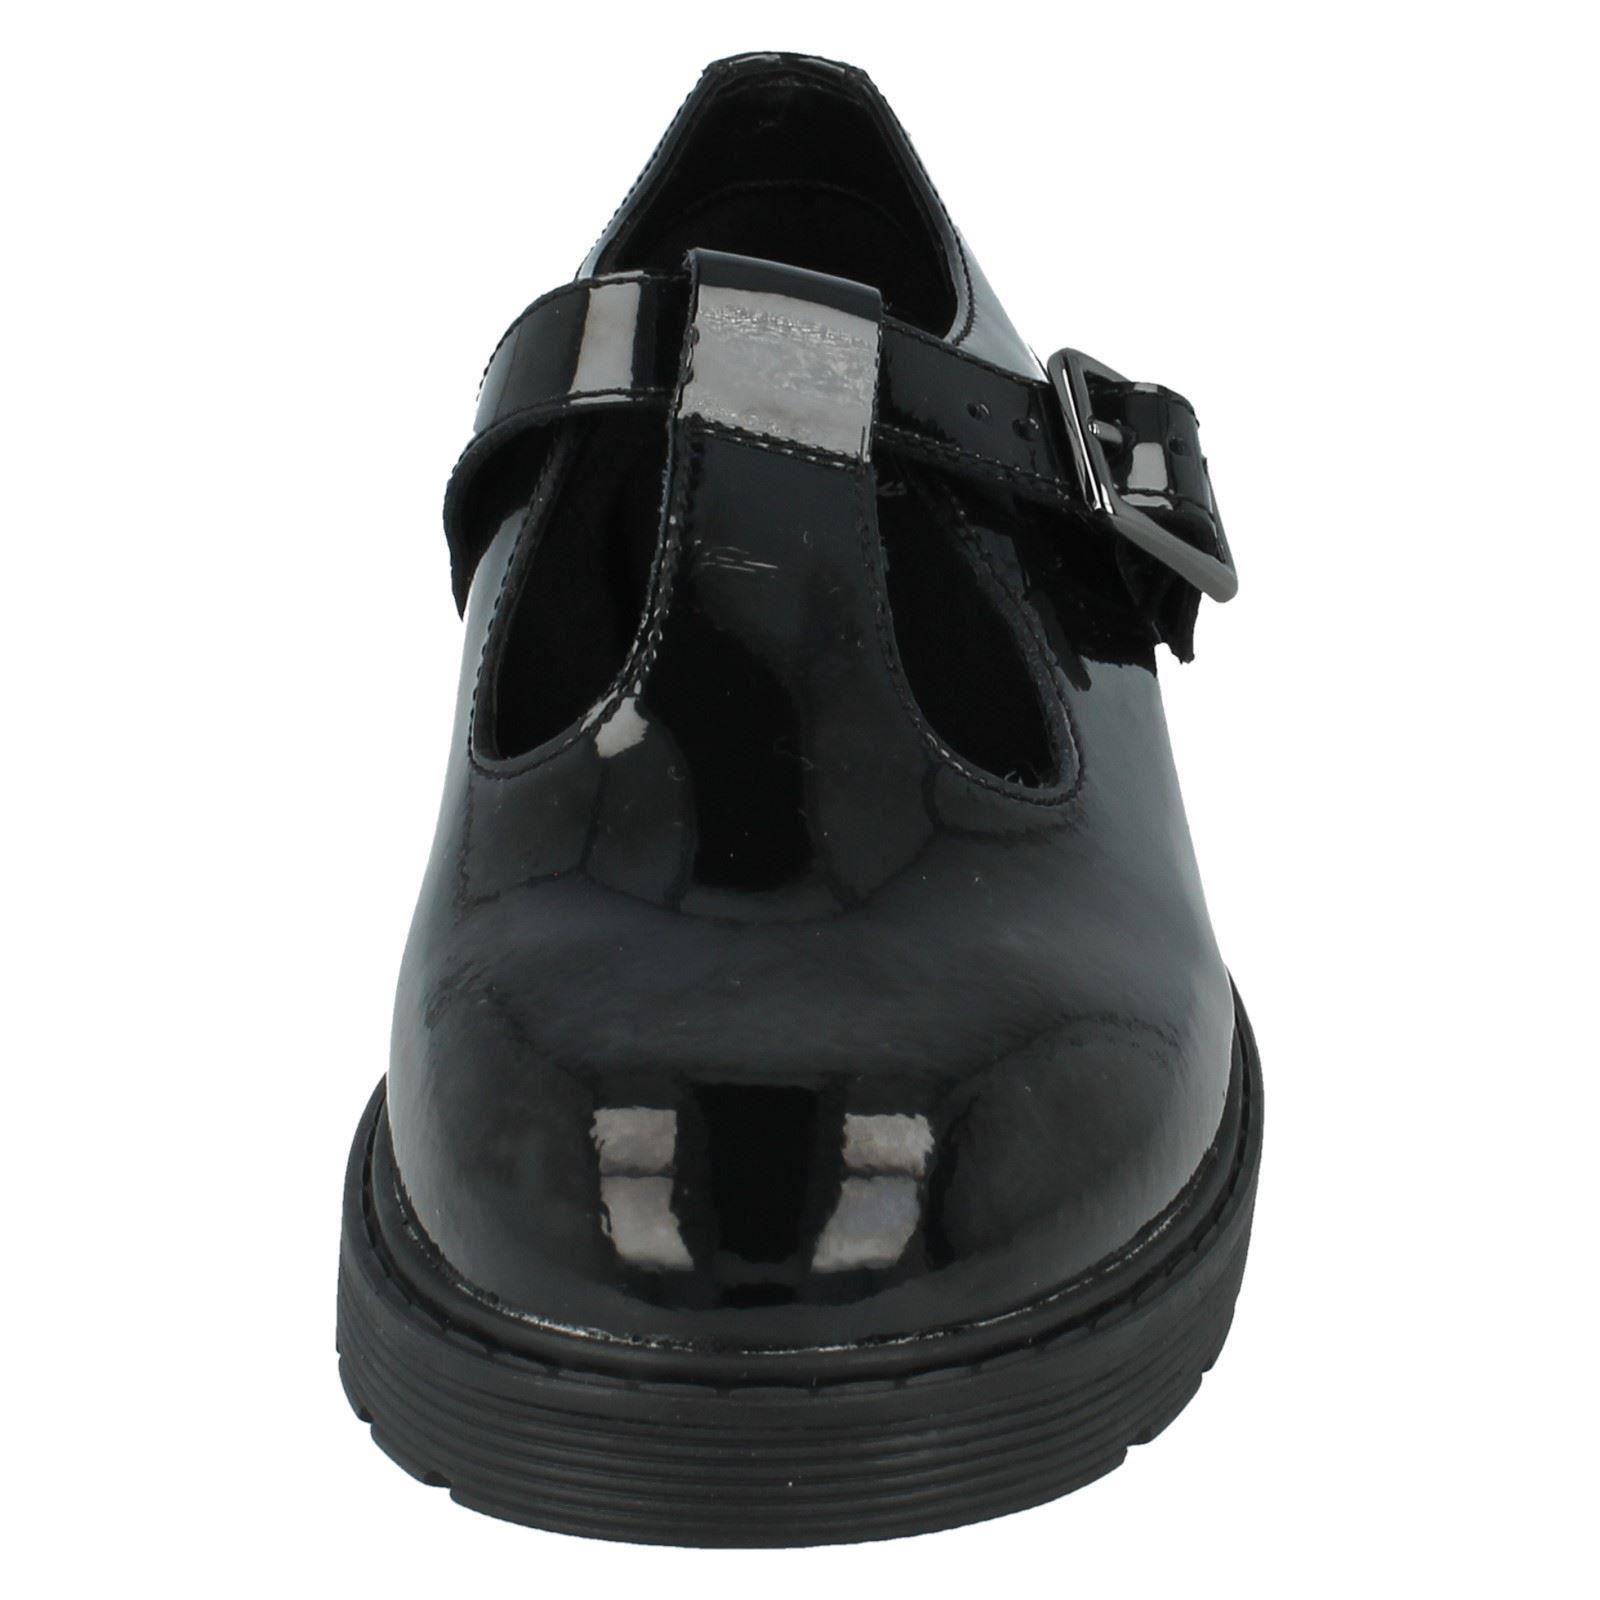 Chicas Clarks Zapatos Purley ir